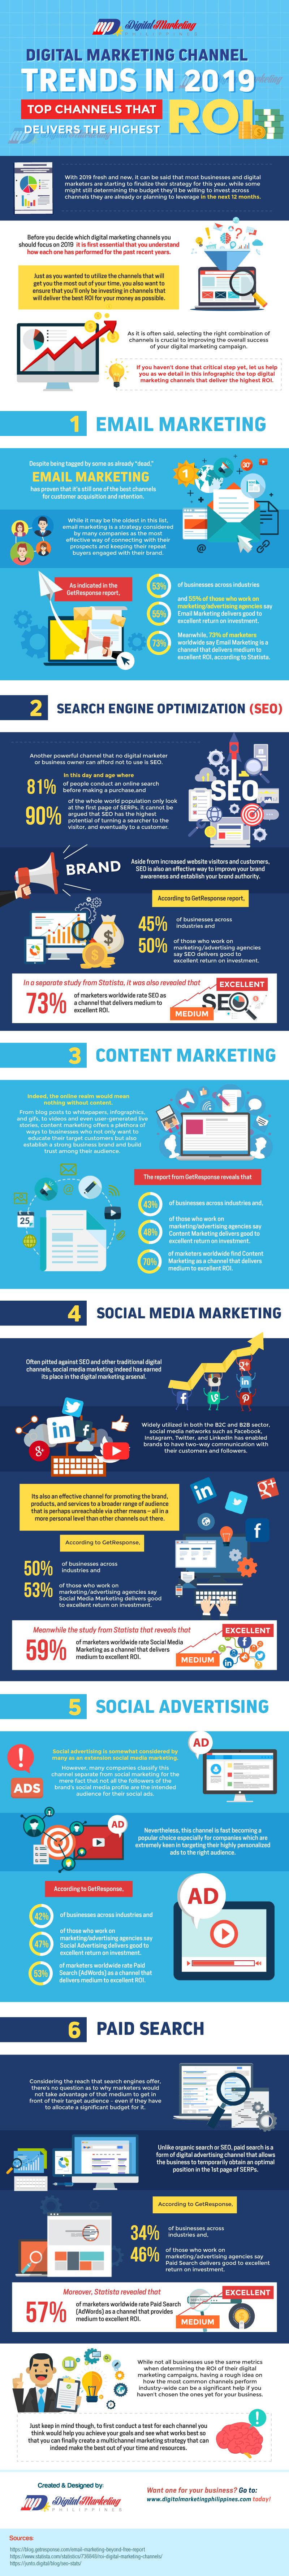 Digital Marketing Channel Trends